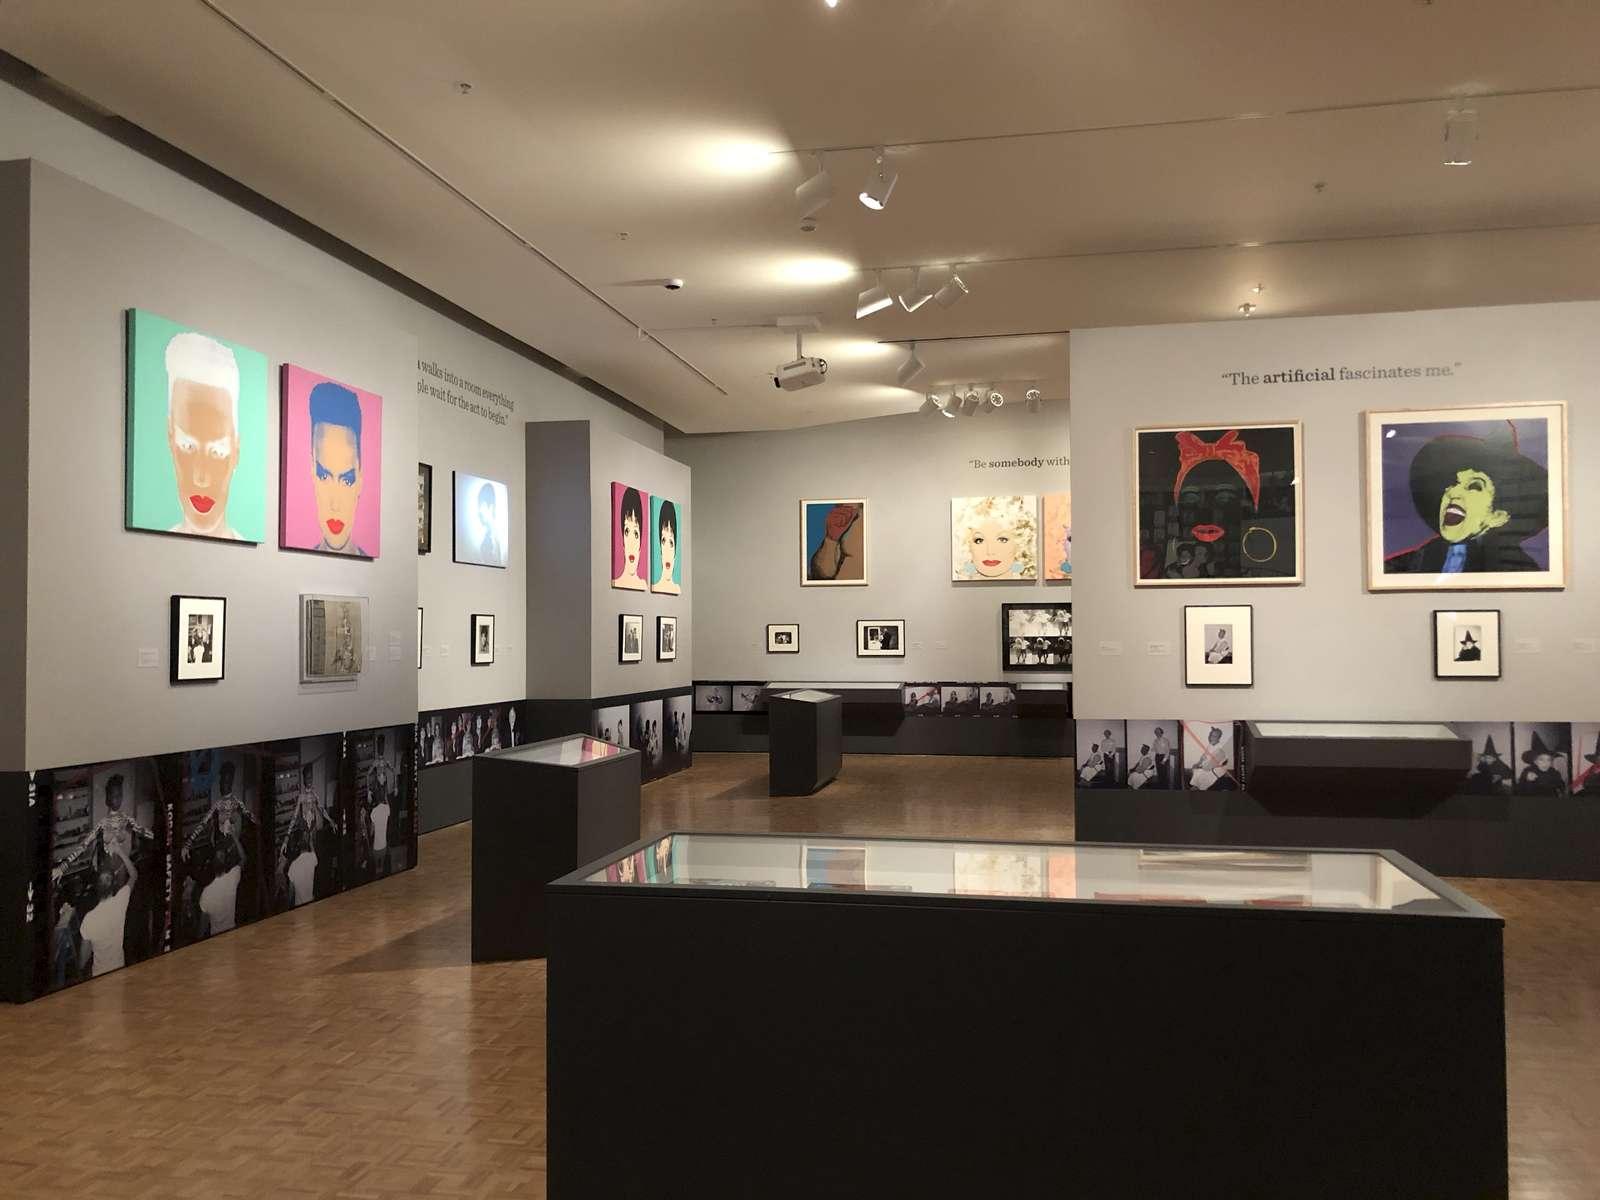 Contact Warhol Exhibition @ Cantor Arts Center